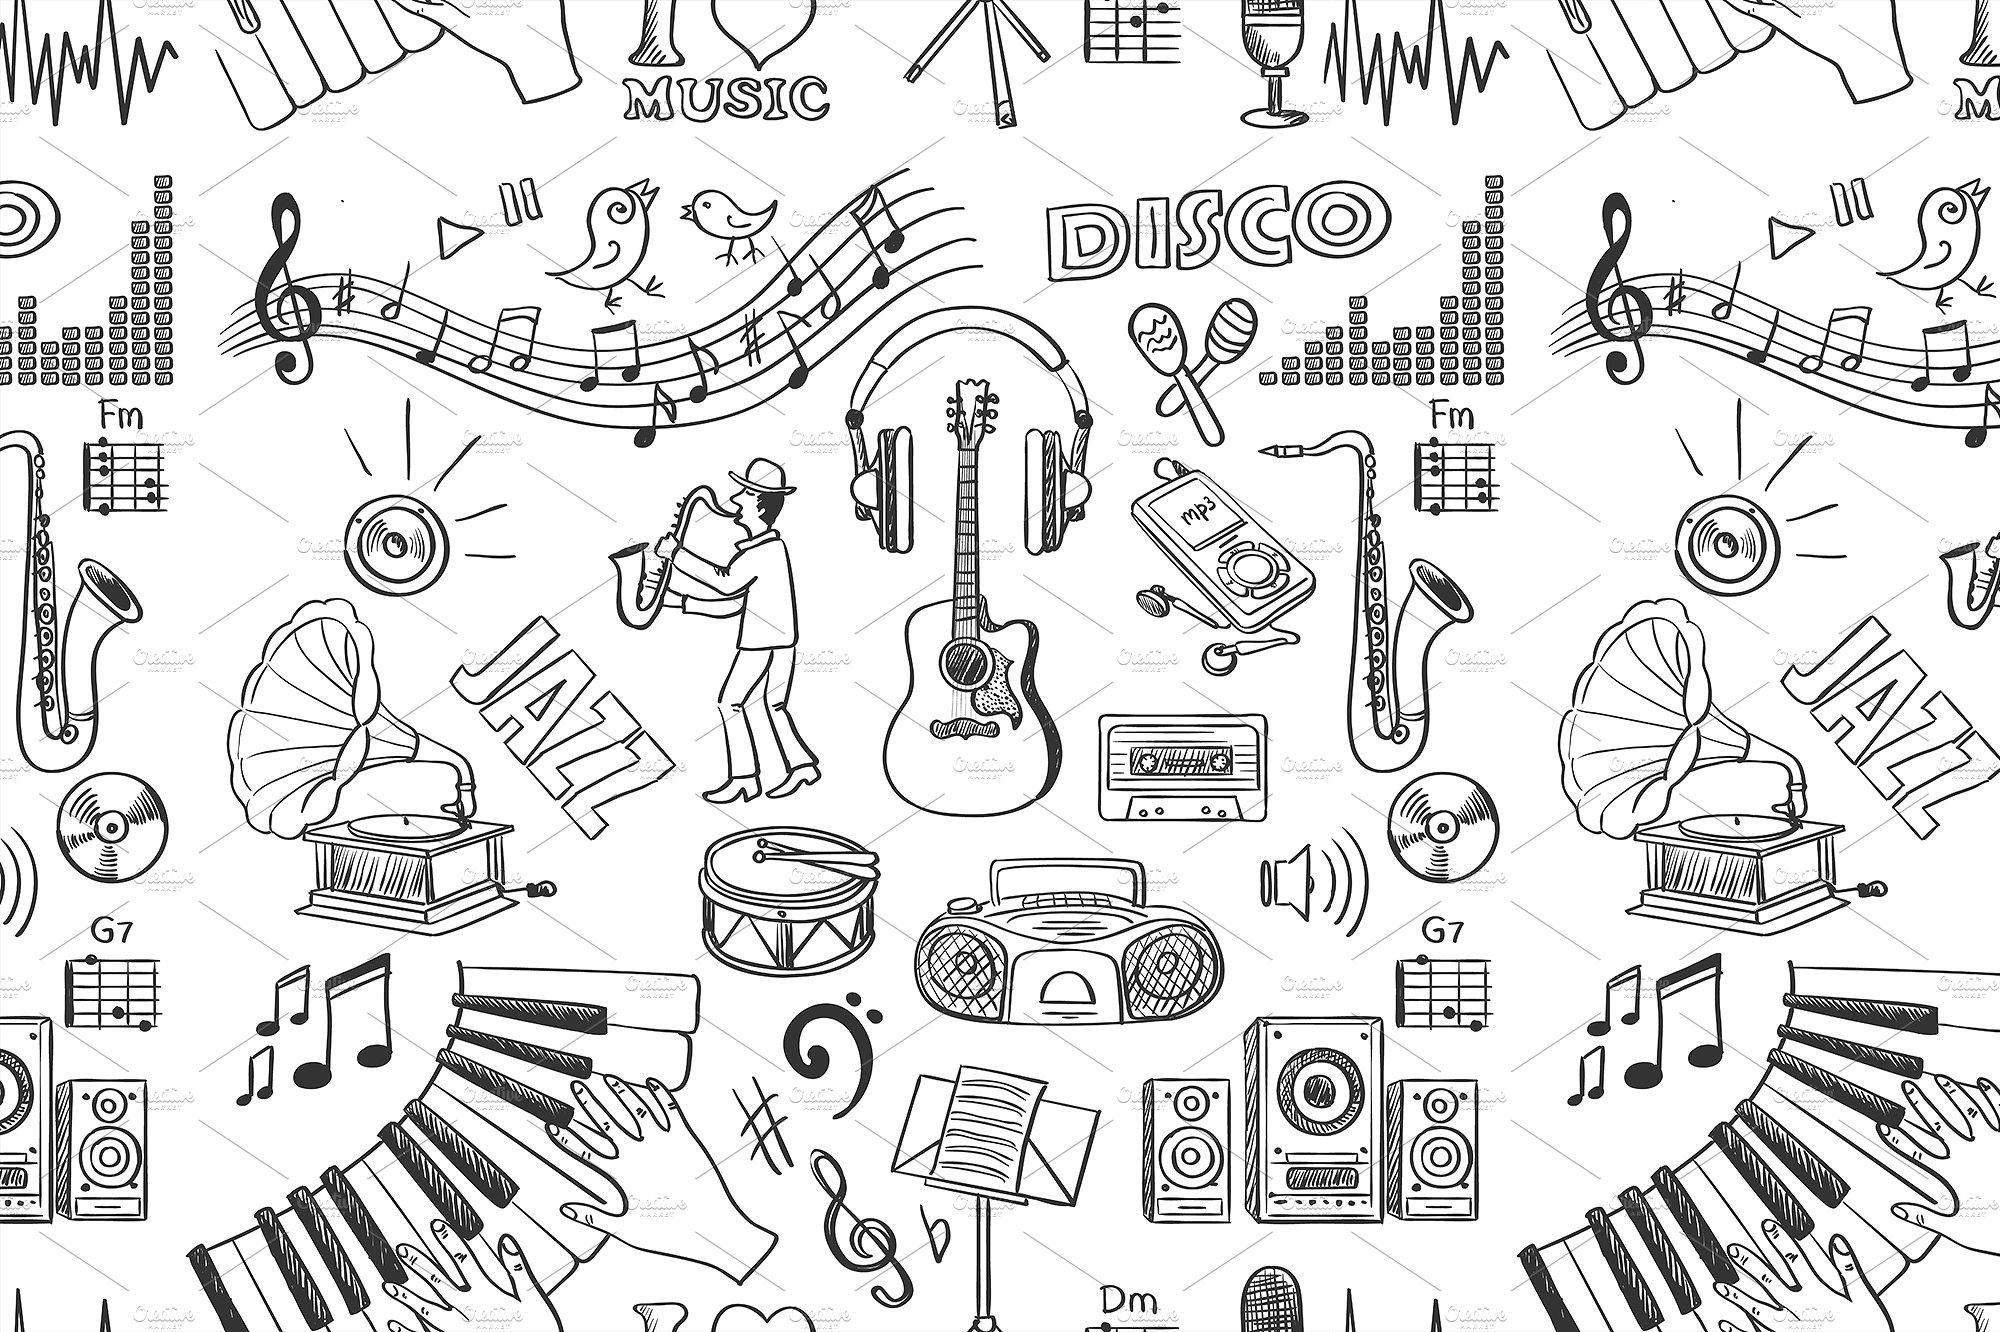 Drawn music hand drawn Music on Creative Hand Market